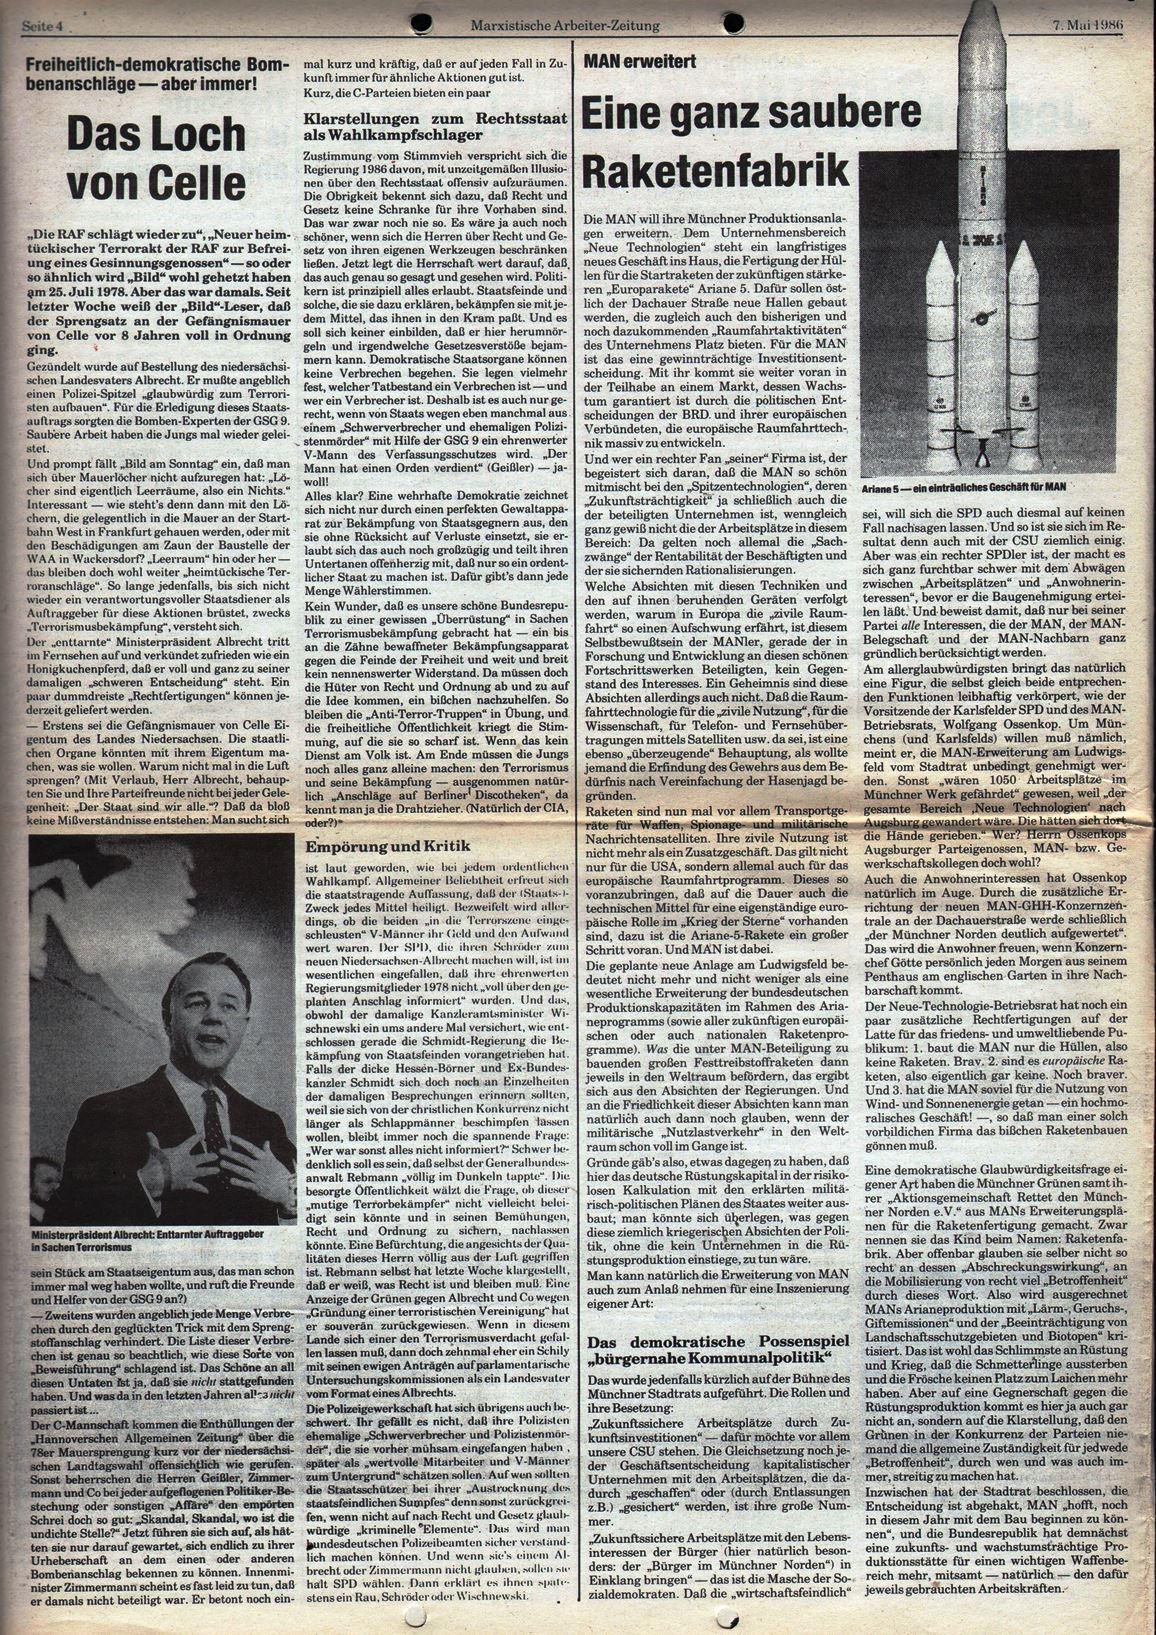 Muenchen_MG_MAZ_MAN_19860320_04